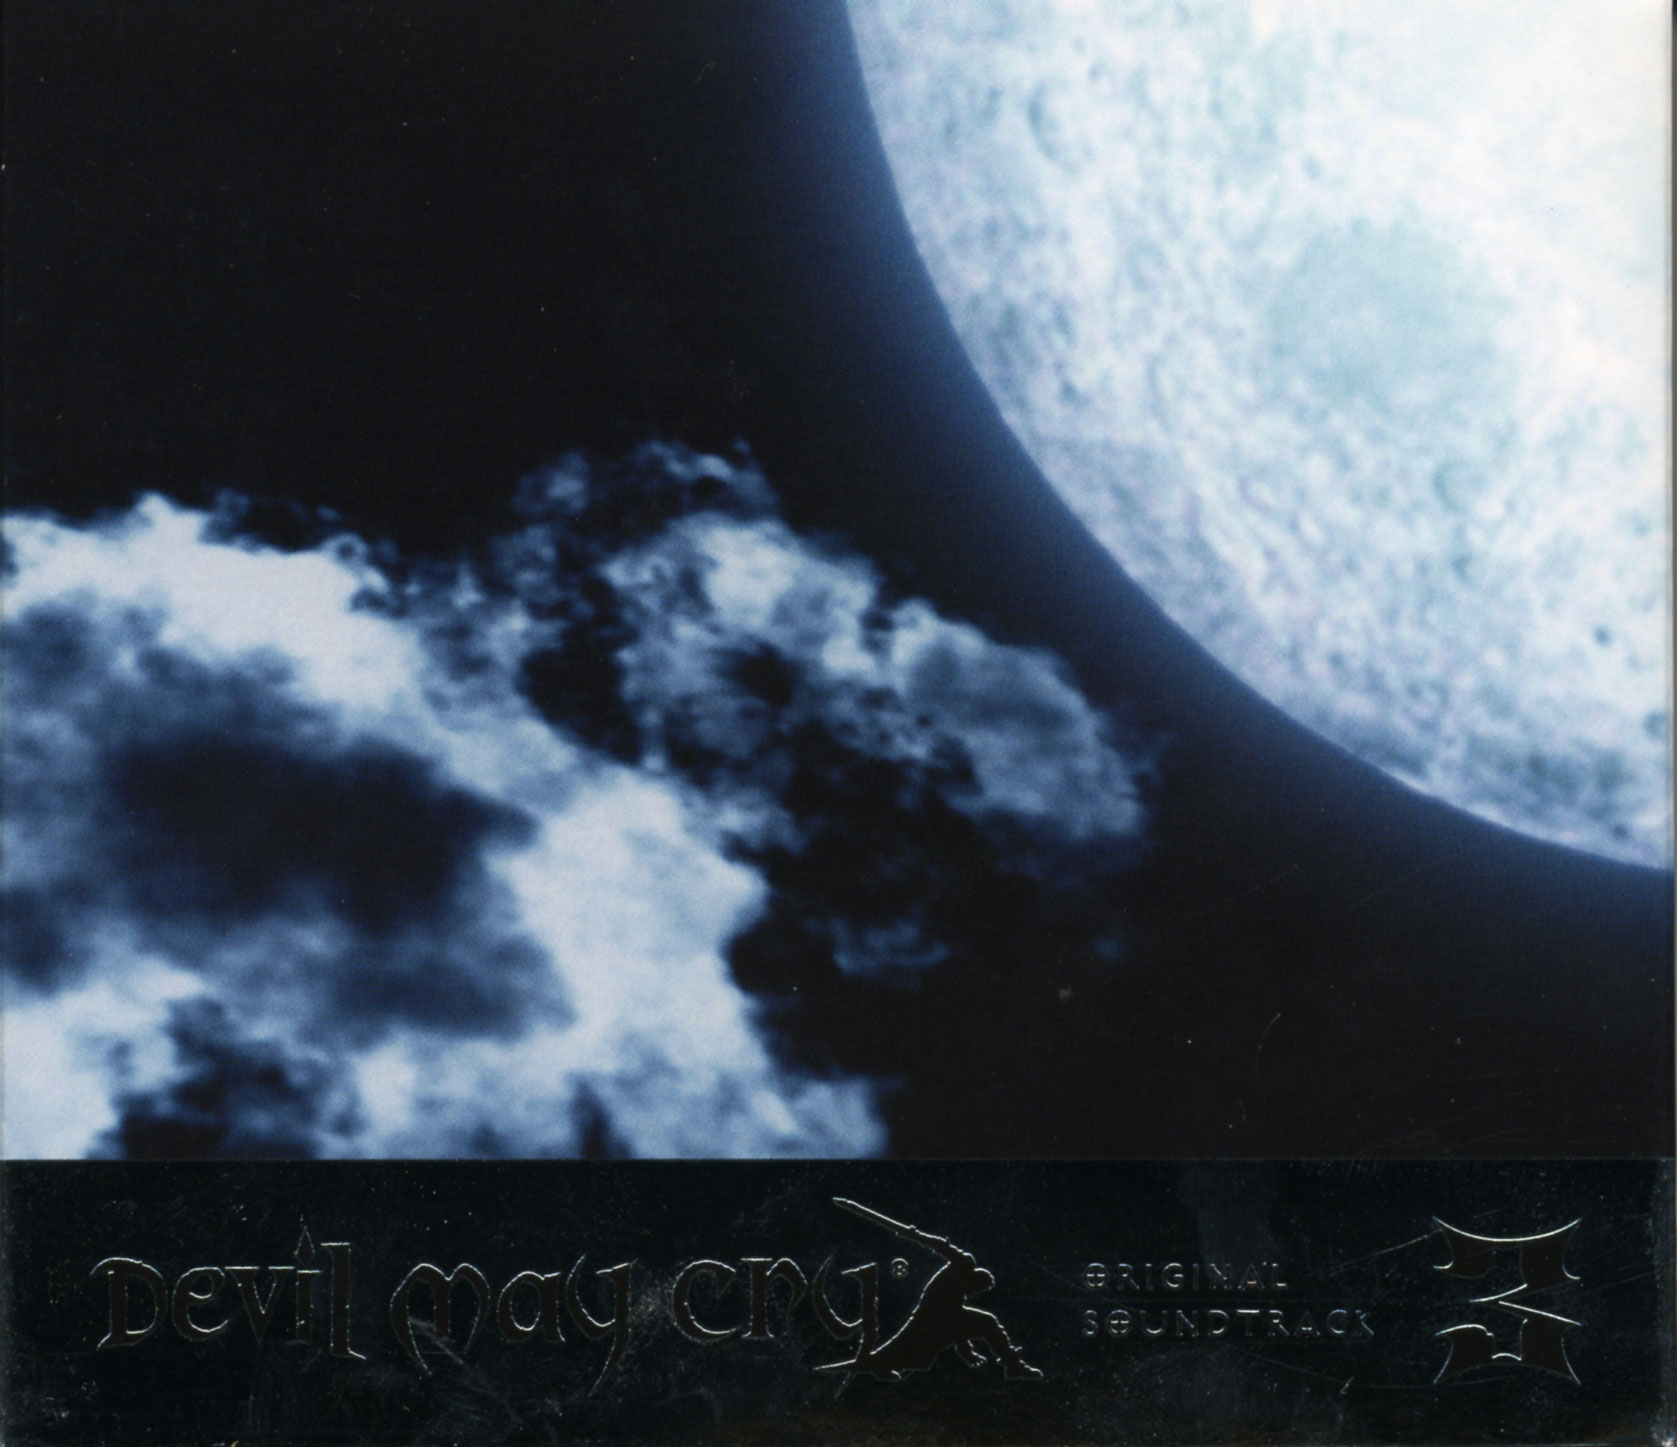 File:Devil May Cry 3 Original Soundtrack.jpg